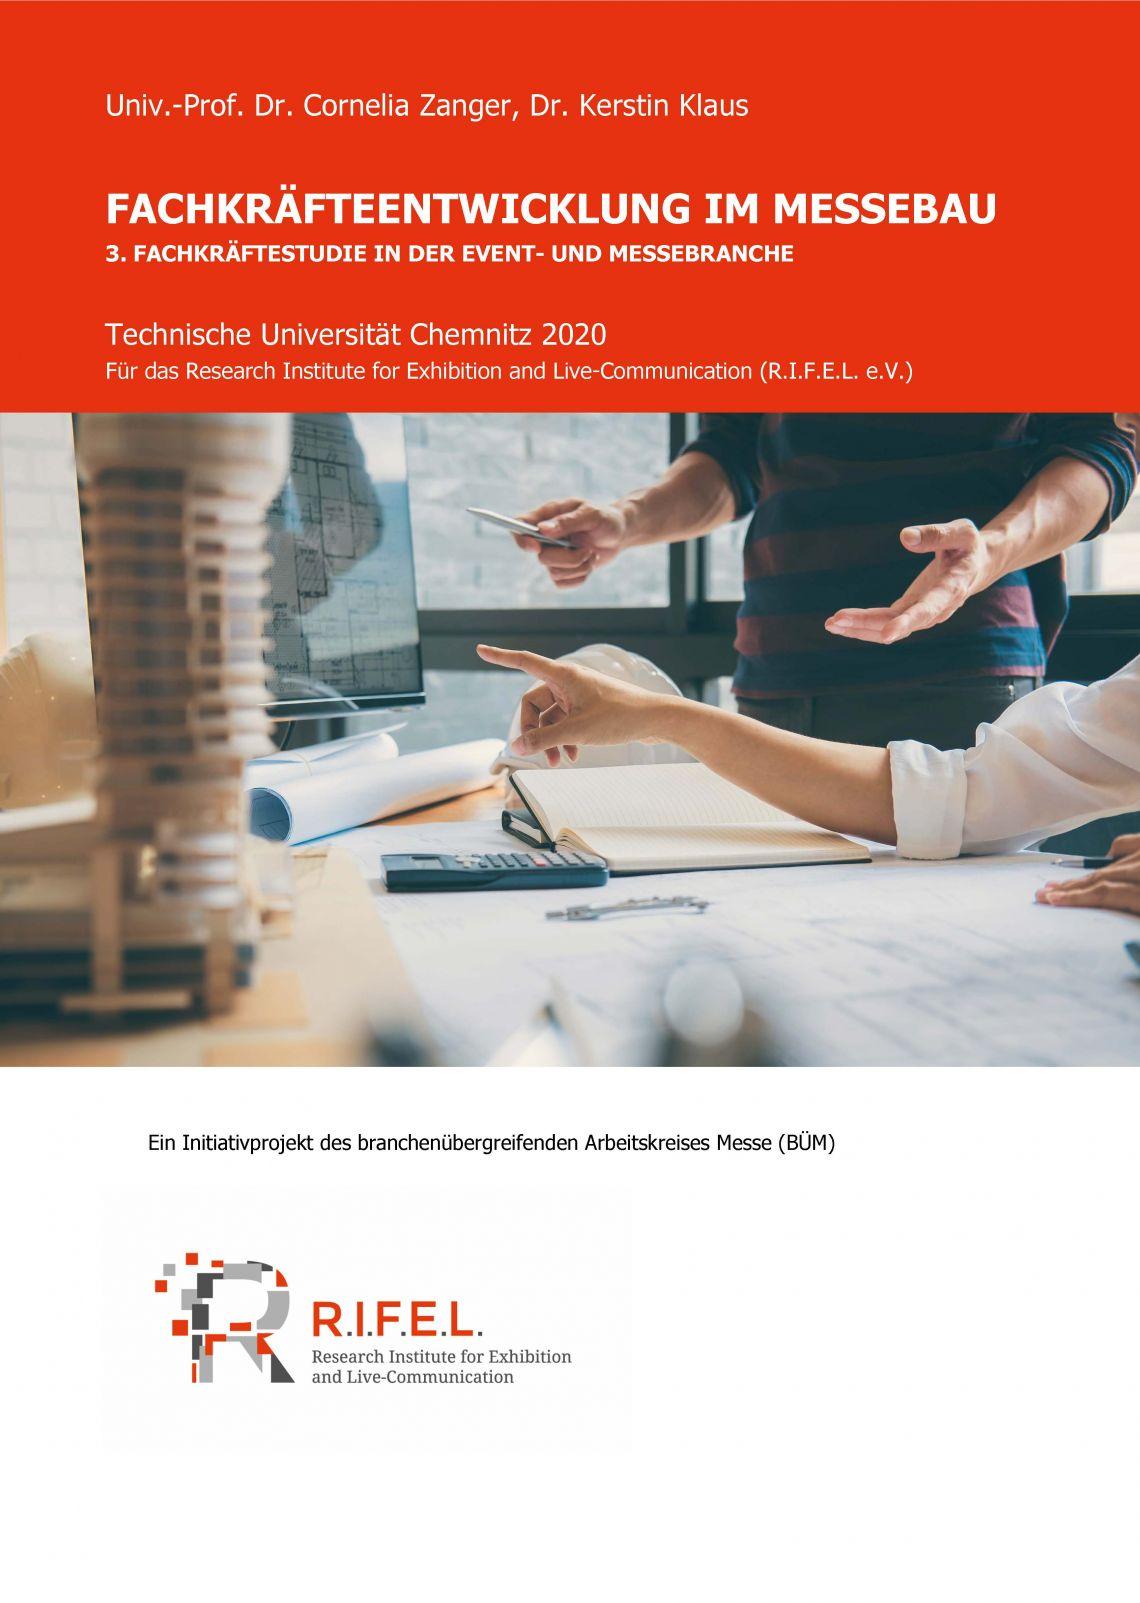 Fachkräftestudie in der Event- und Messebaubranche des R.I.F.E.L, e. V.